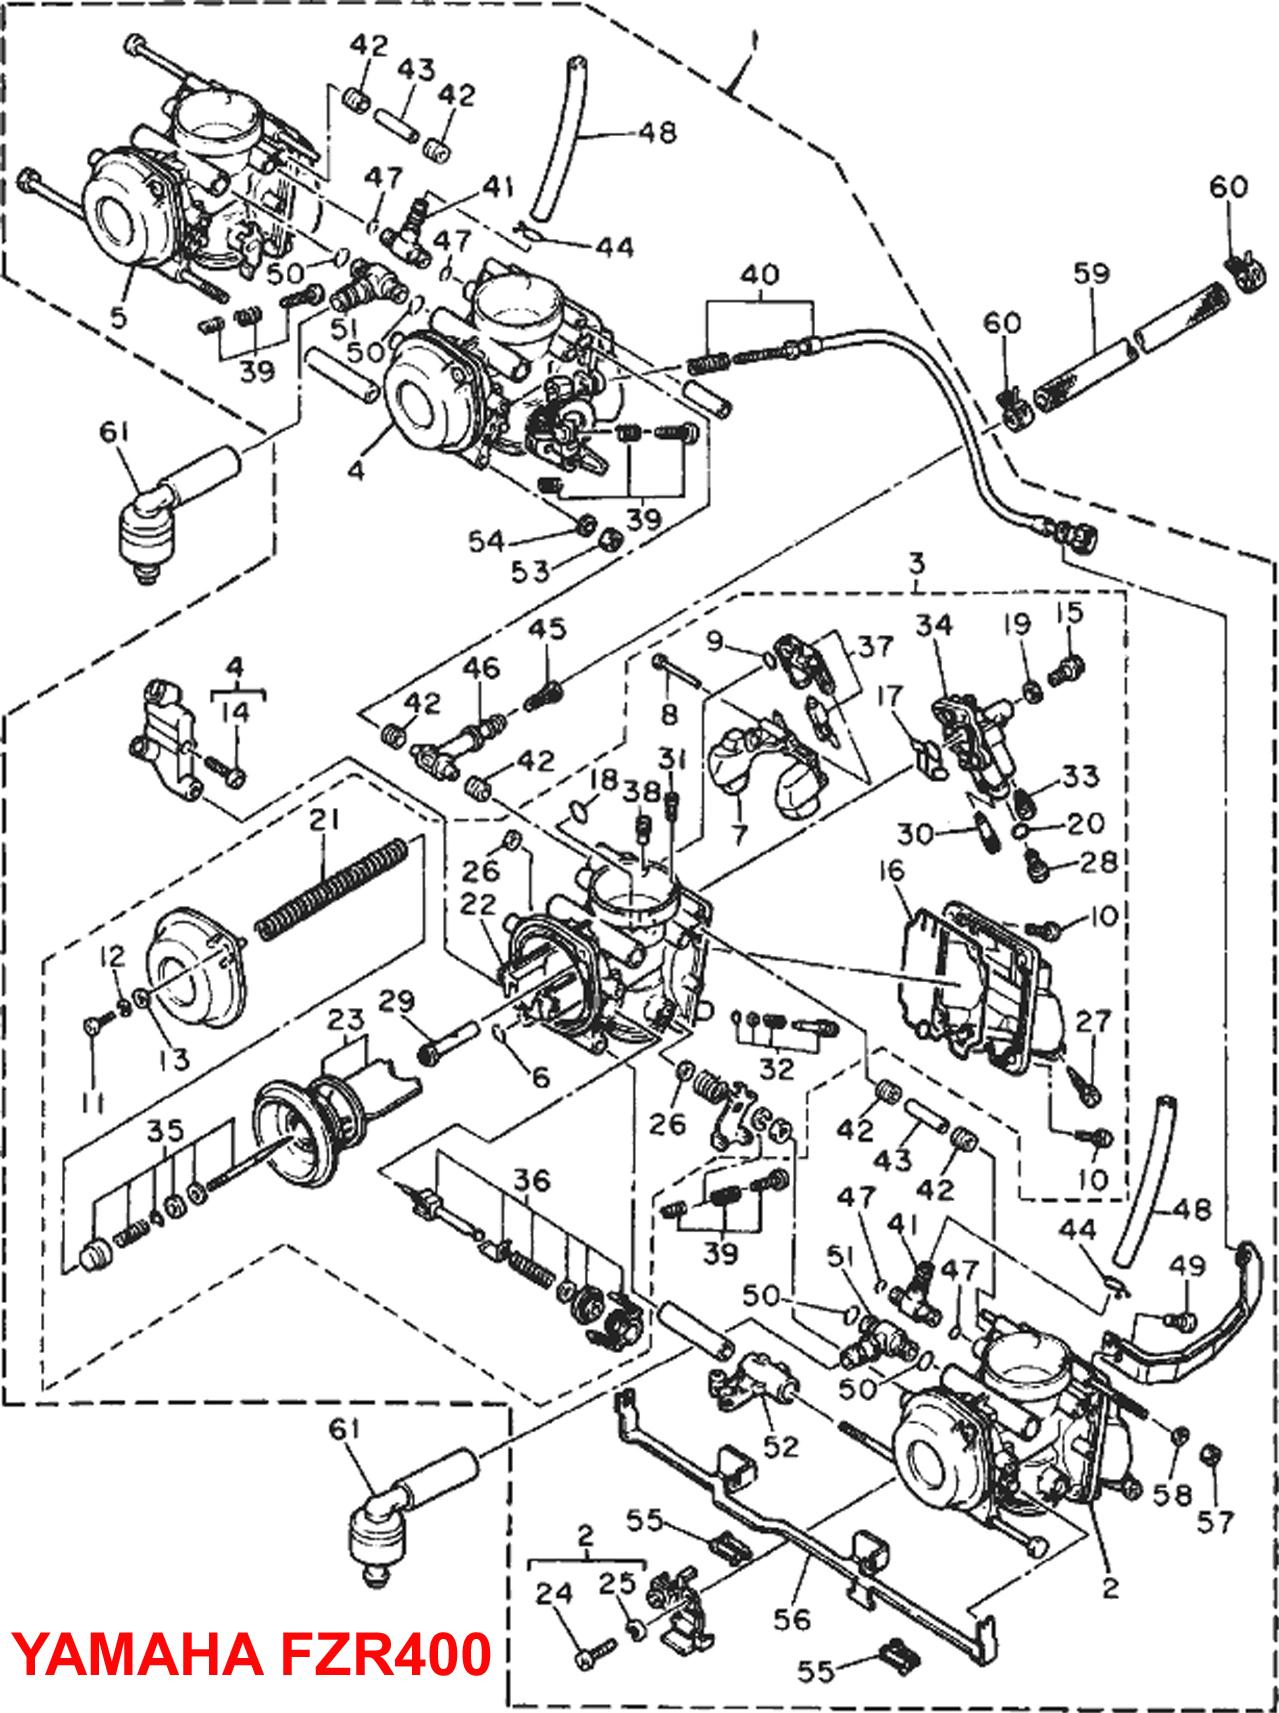 yamaha fzr400 carb carburettor diagram yampart.com